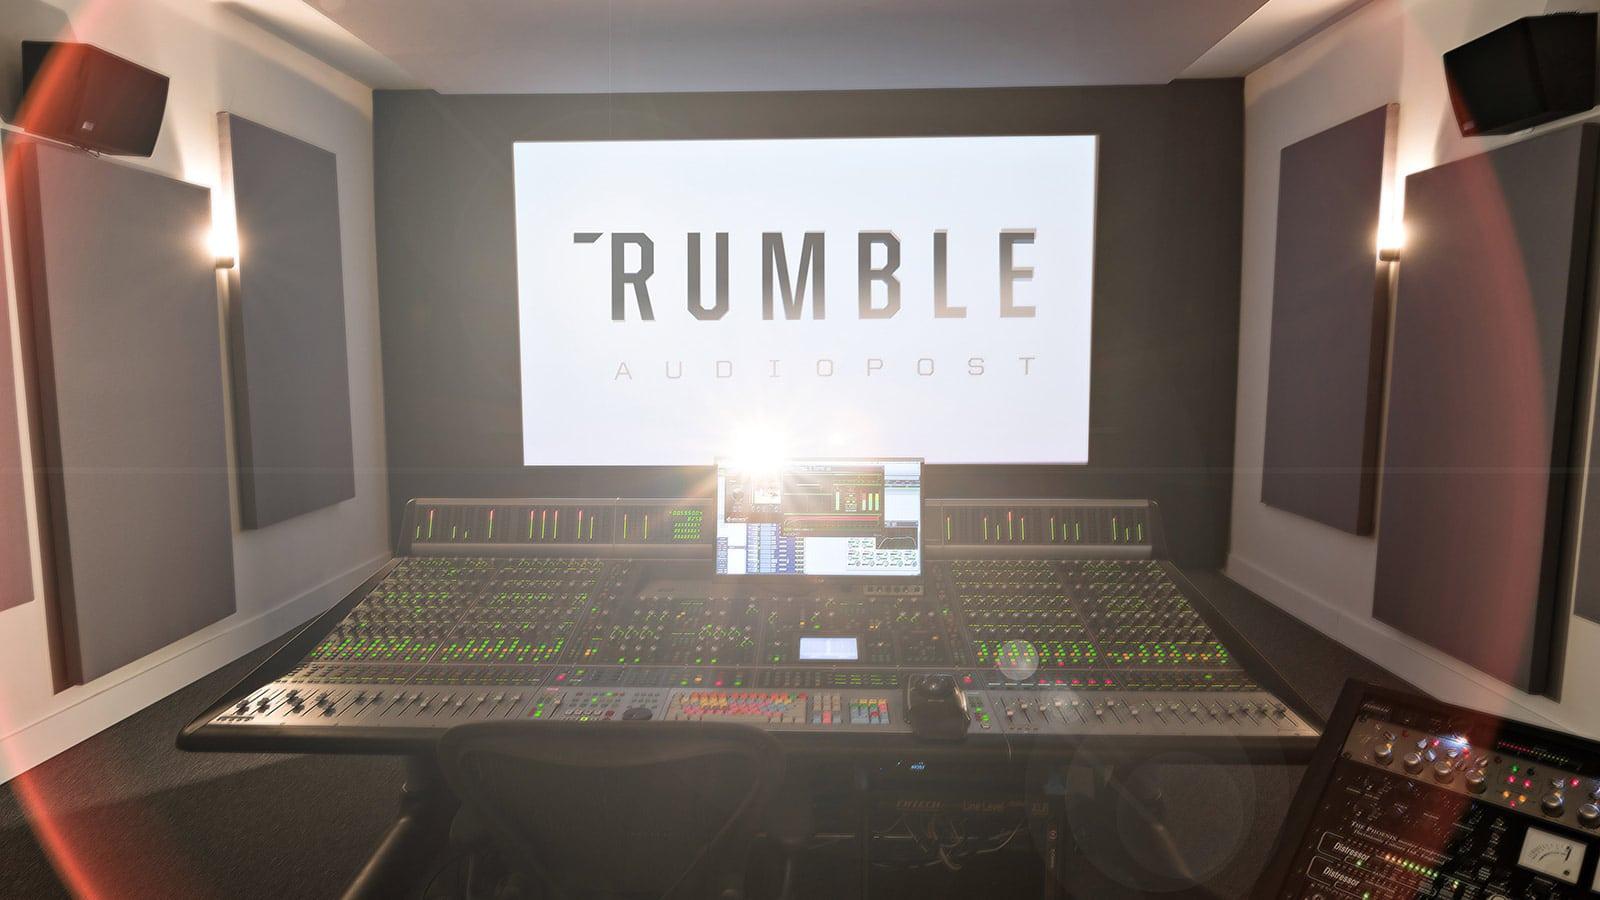 Rumble Audio Post | Meyer Sound